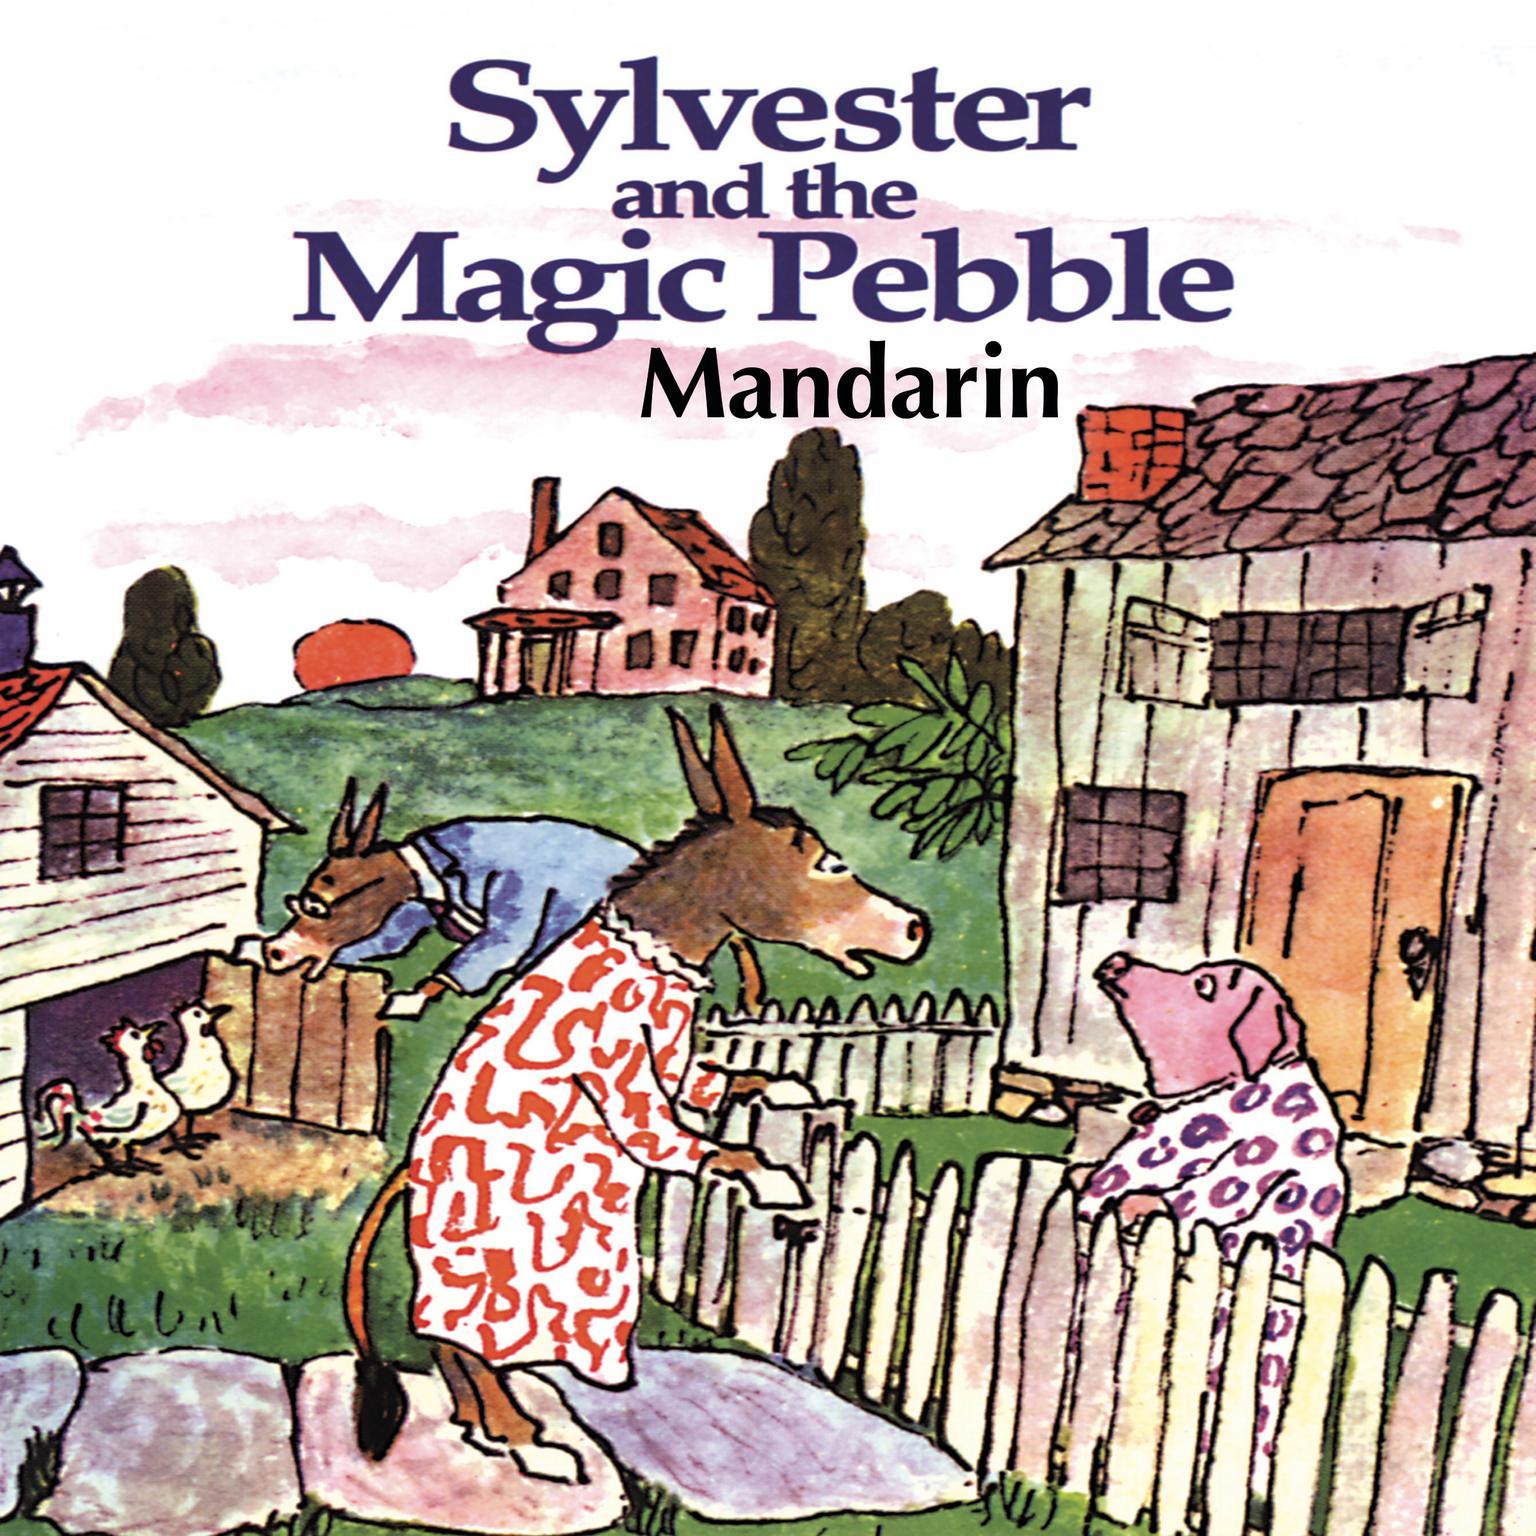 Sylvester & The Magic Pebble [Mandarin Edition] Audiobook, by William Steig